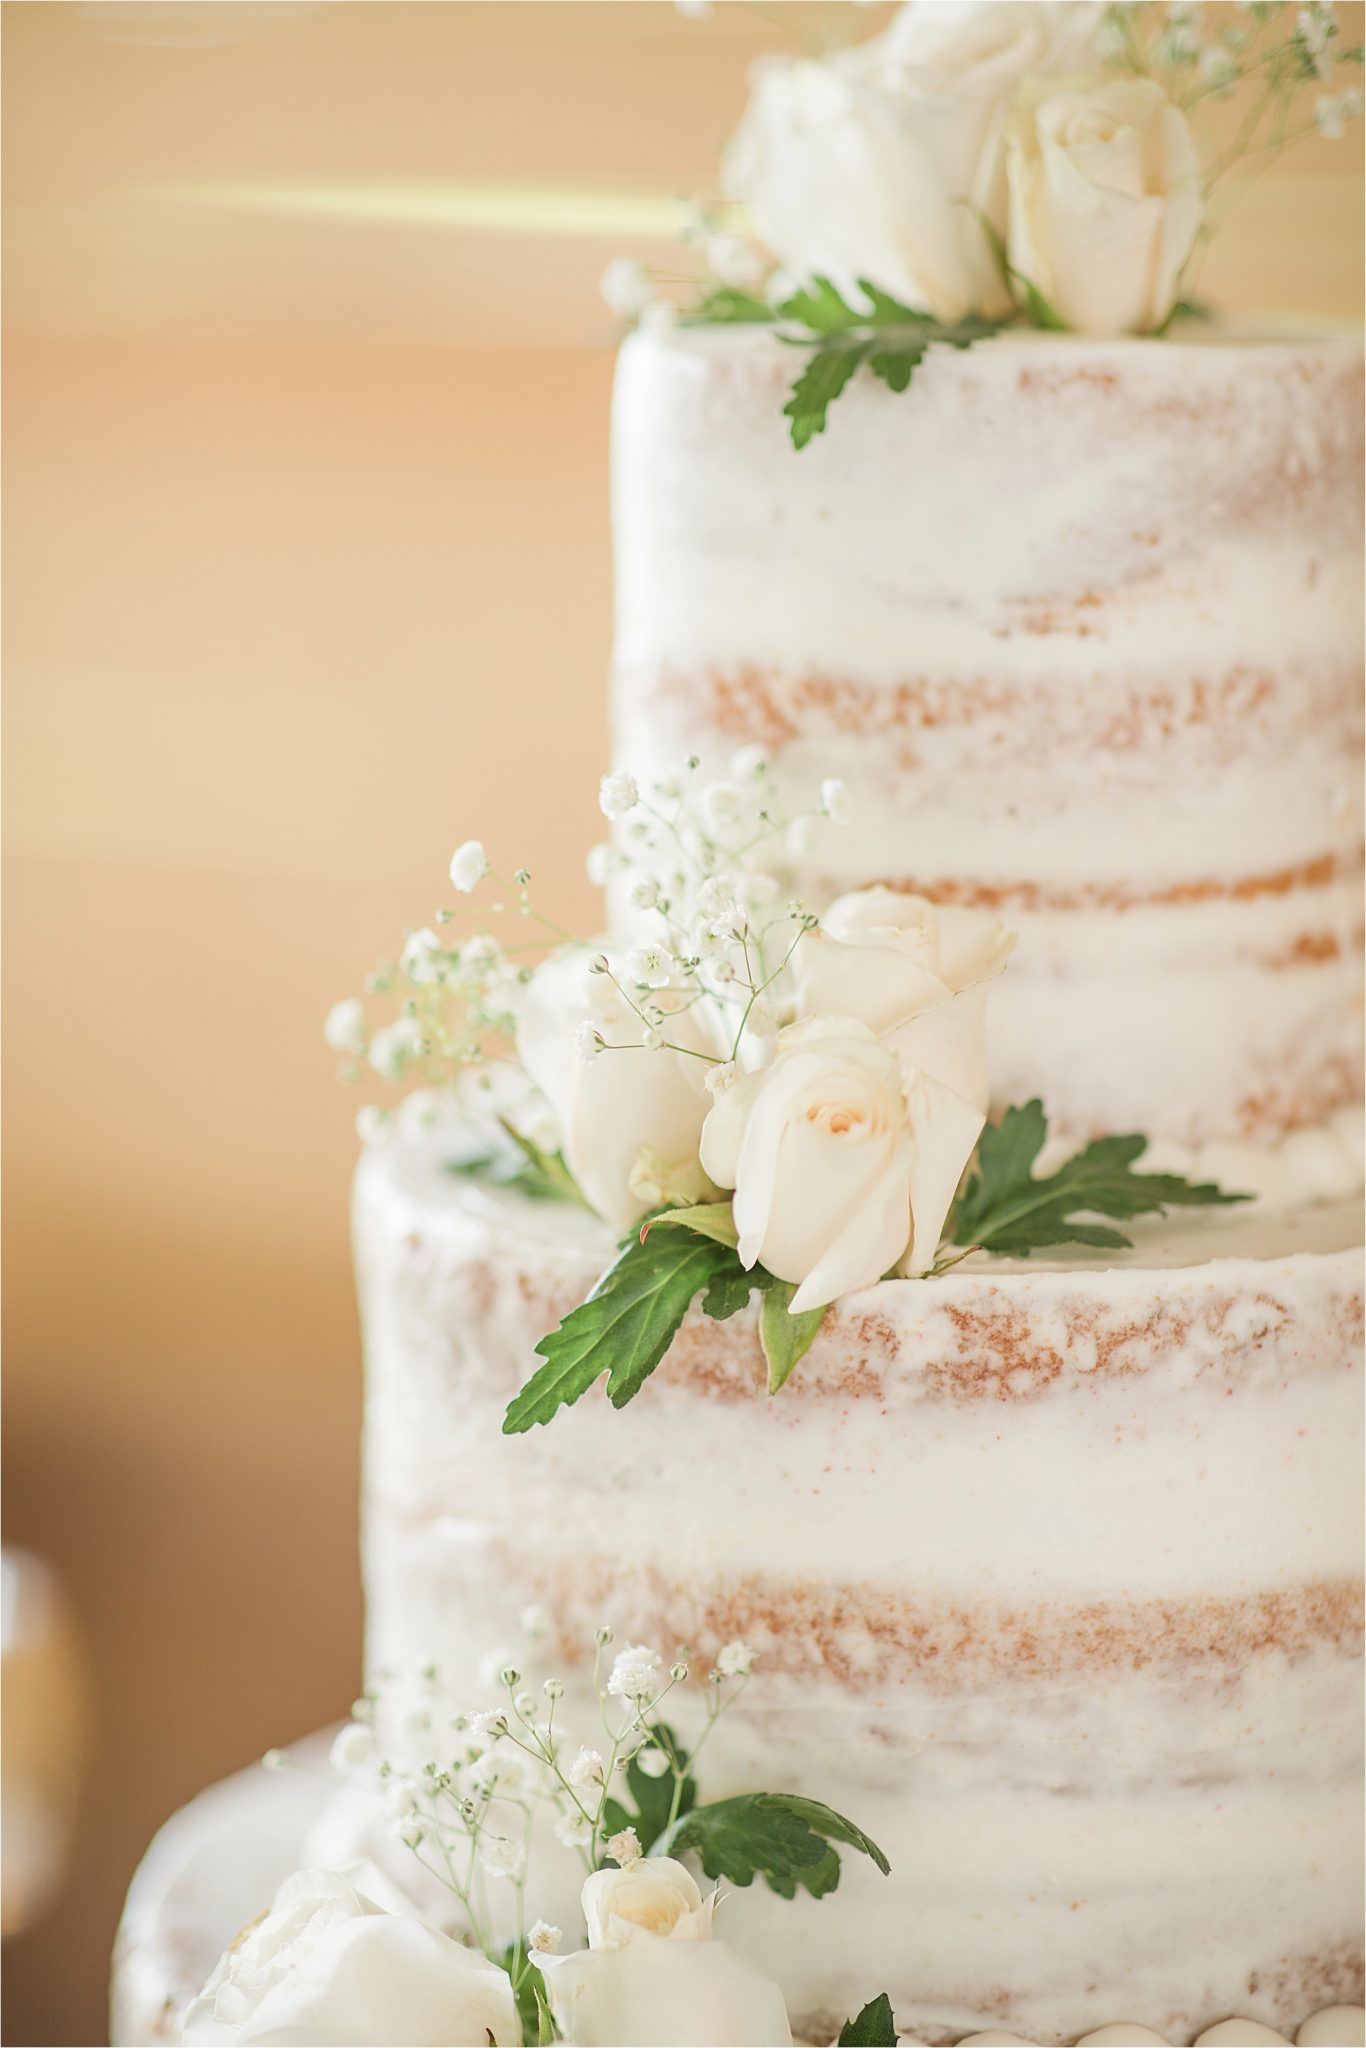 Hedge Farm Wedding, Alabama Wedding Photographer, Barn Wedding, Wedding Cake